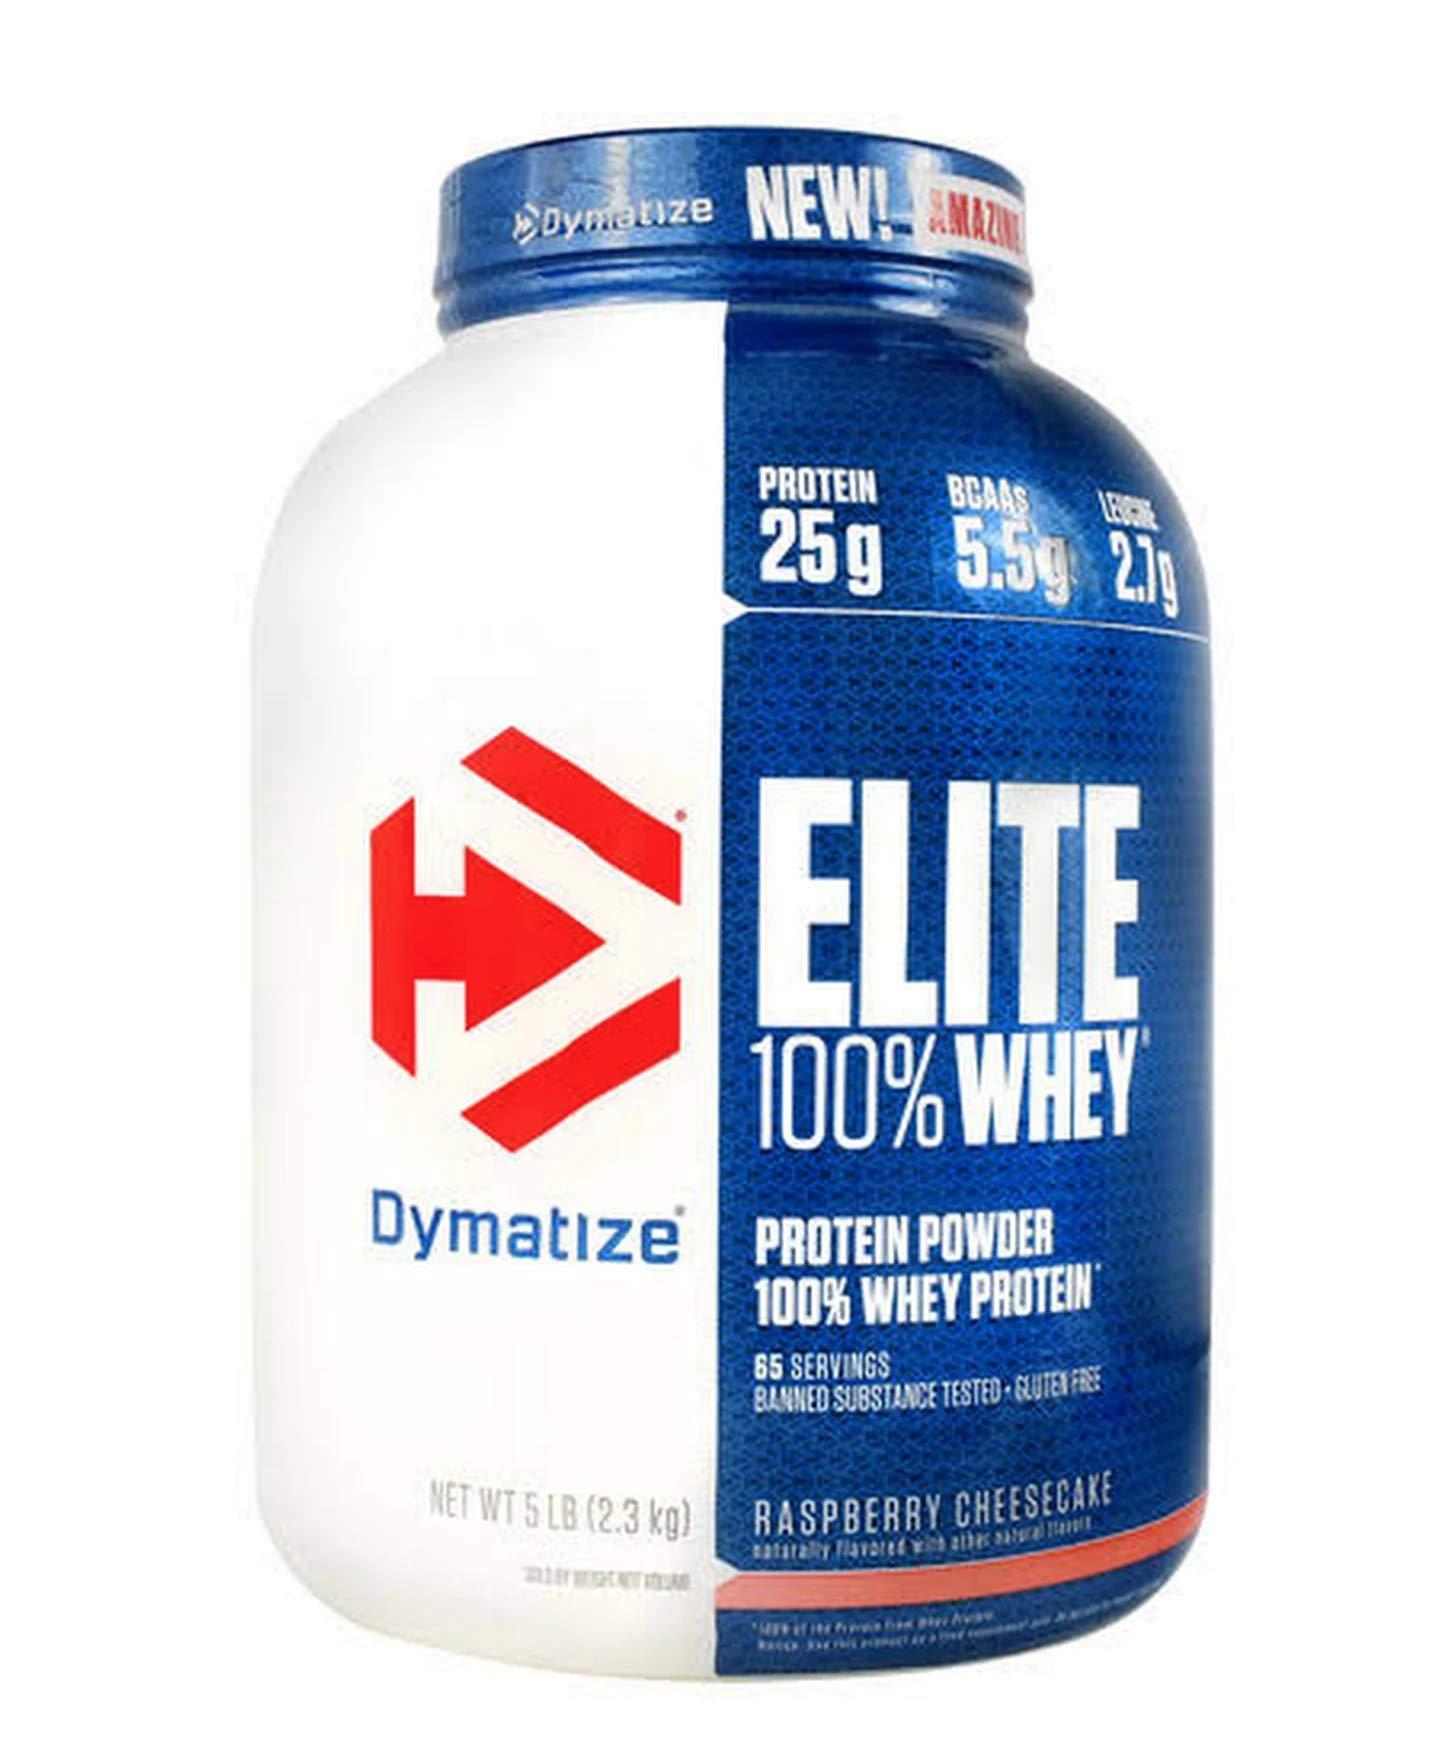 Dymatize Elite Whey Protein Powder, Raspberry Cheesecake, 5 Pound by Dymatize